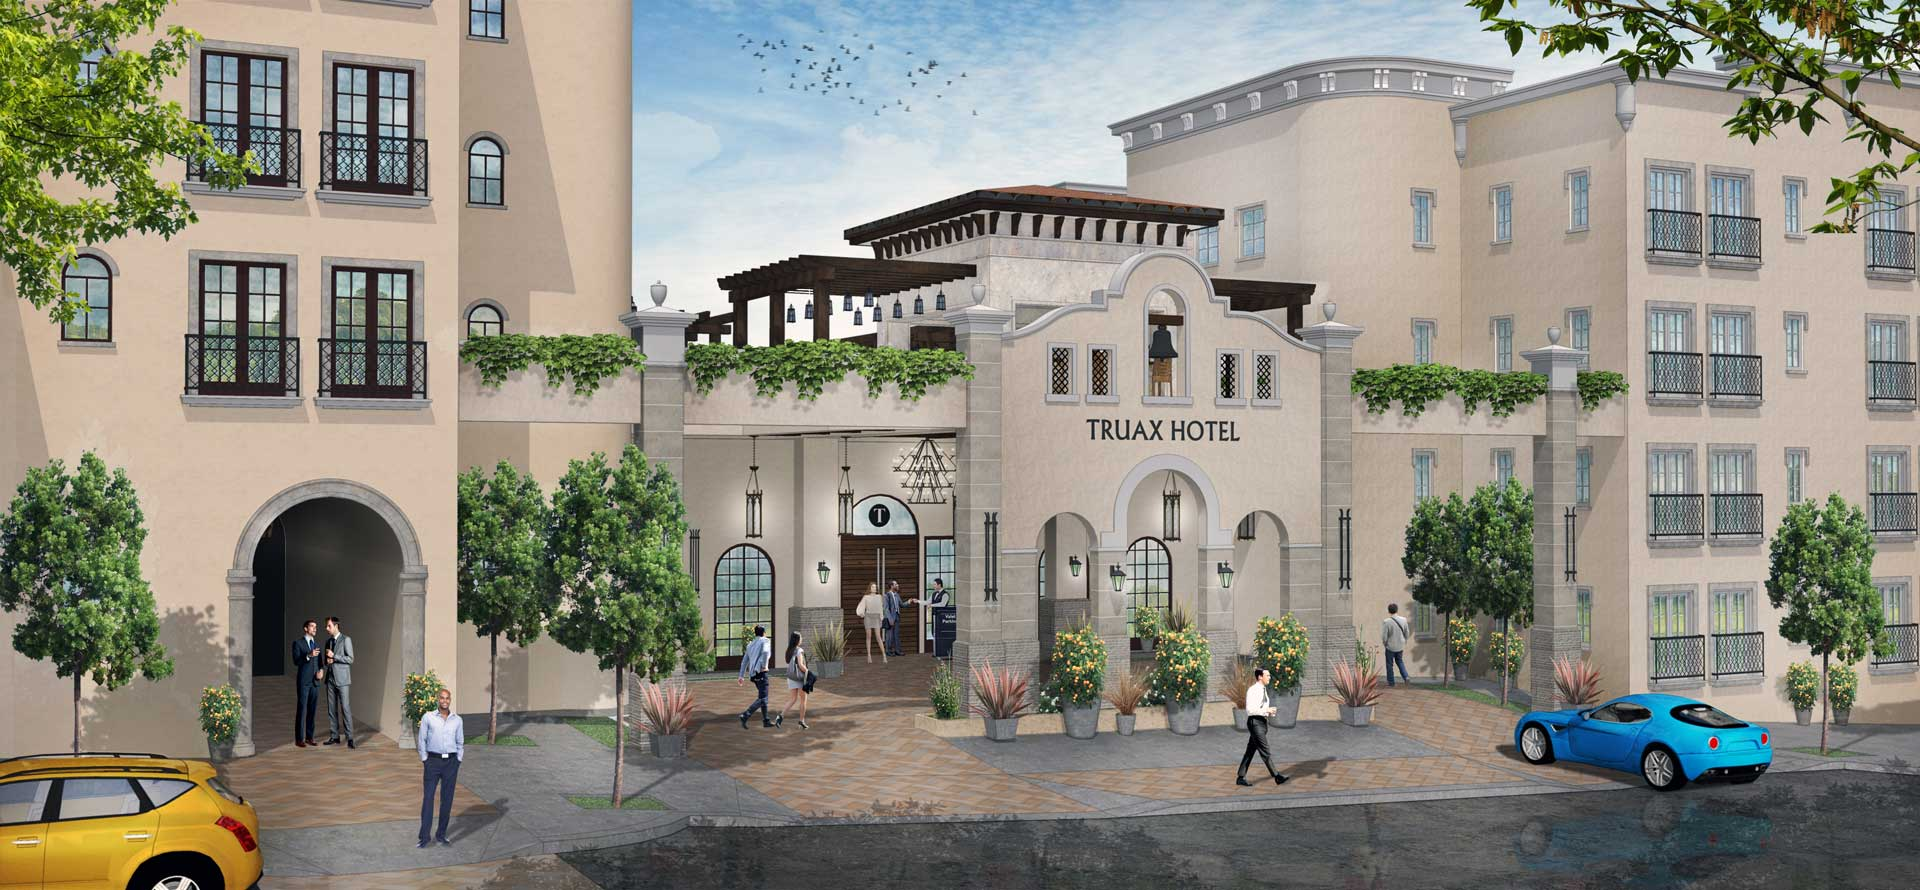 Truax Hotel Exterior Web Optimized May 2018 (2)